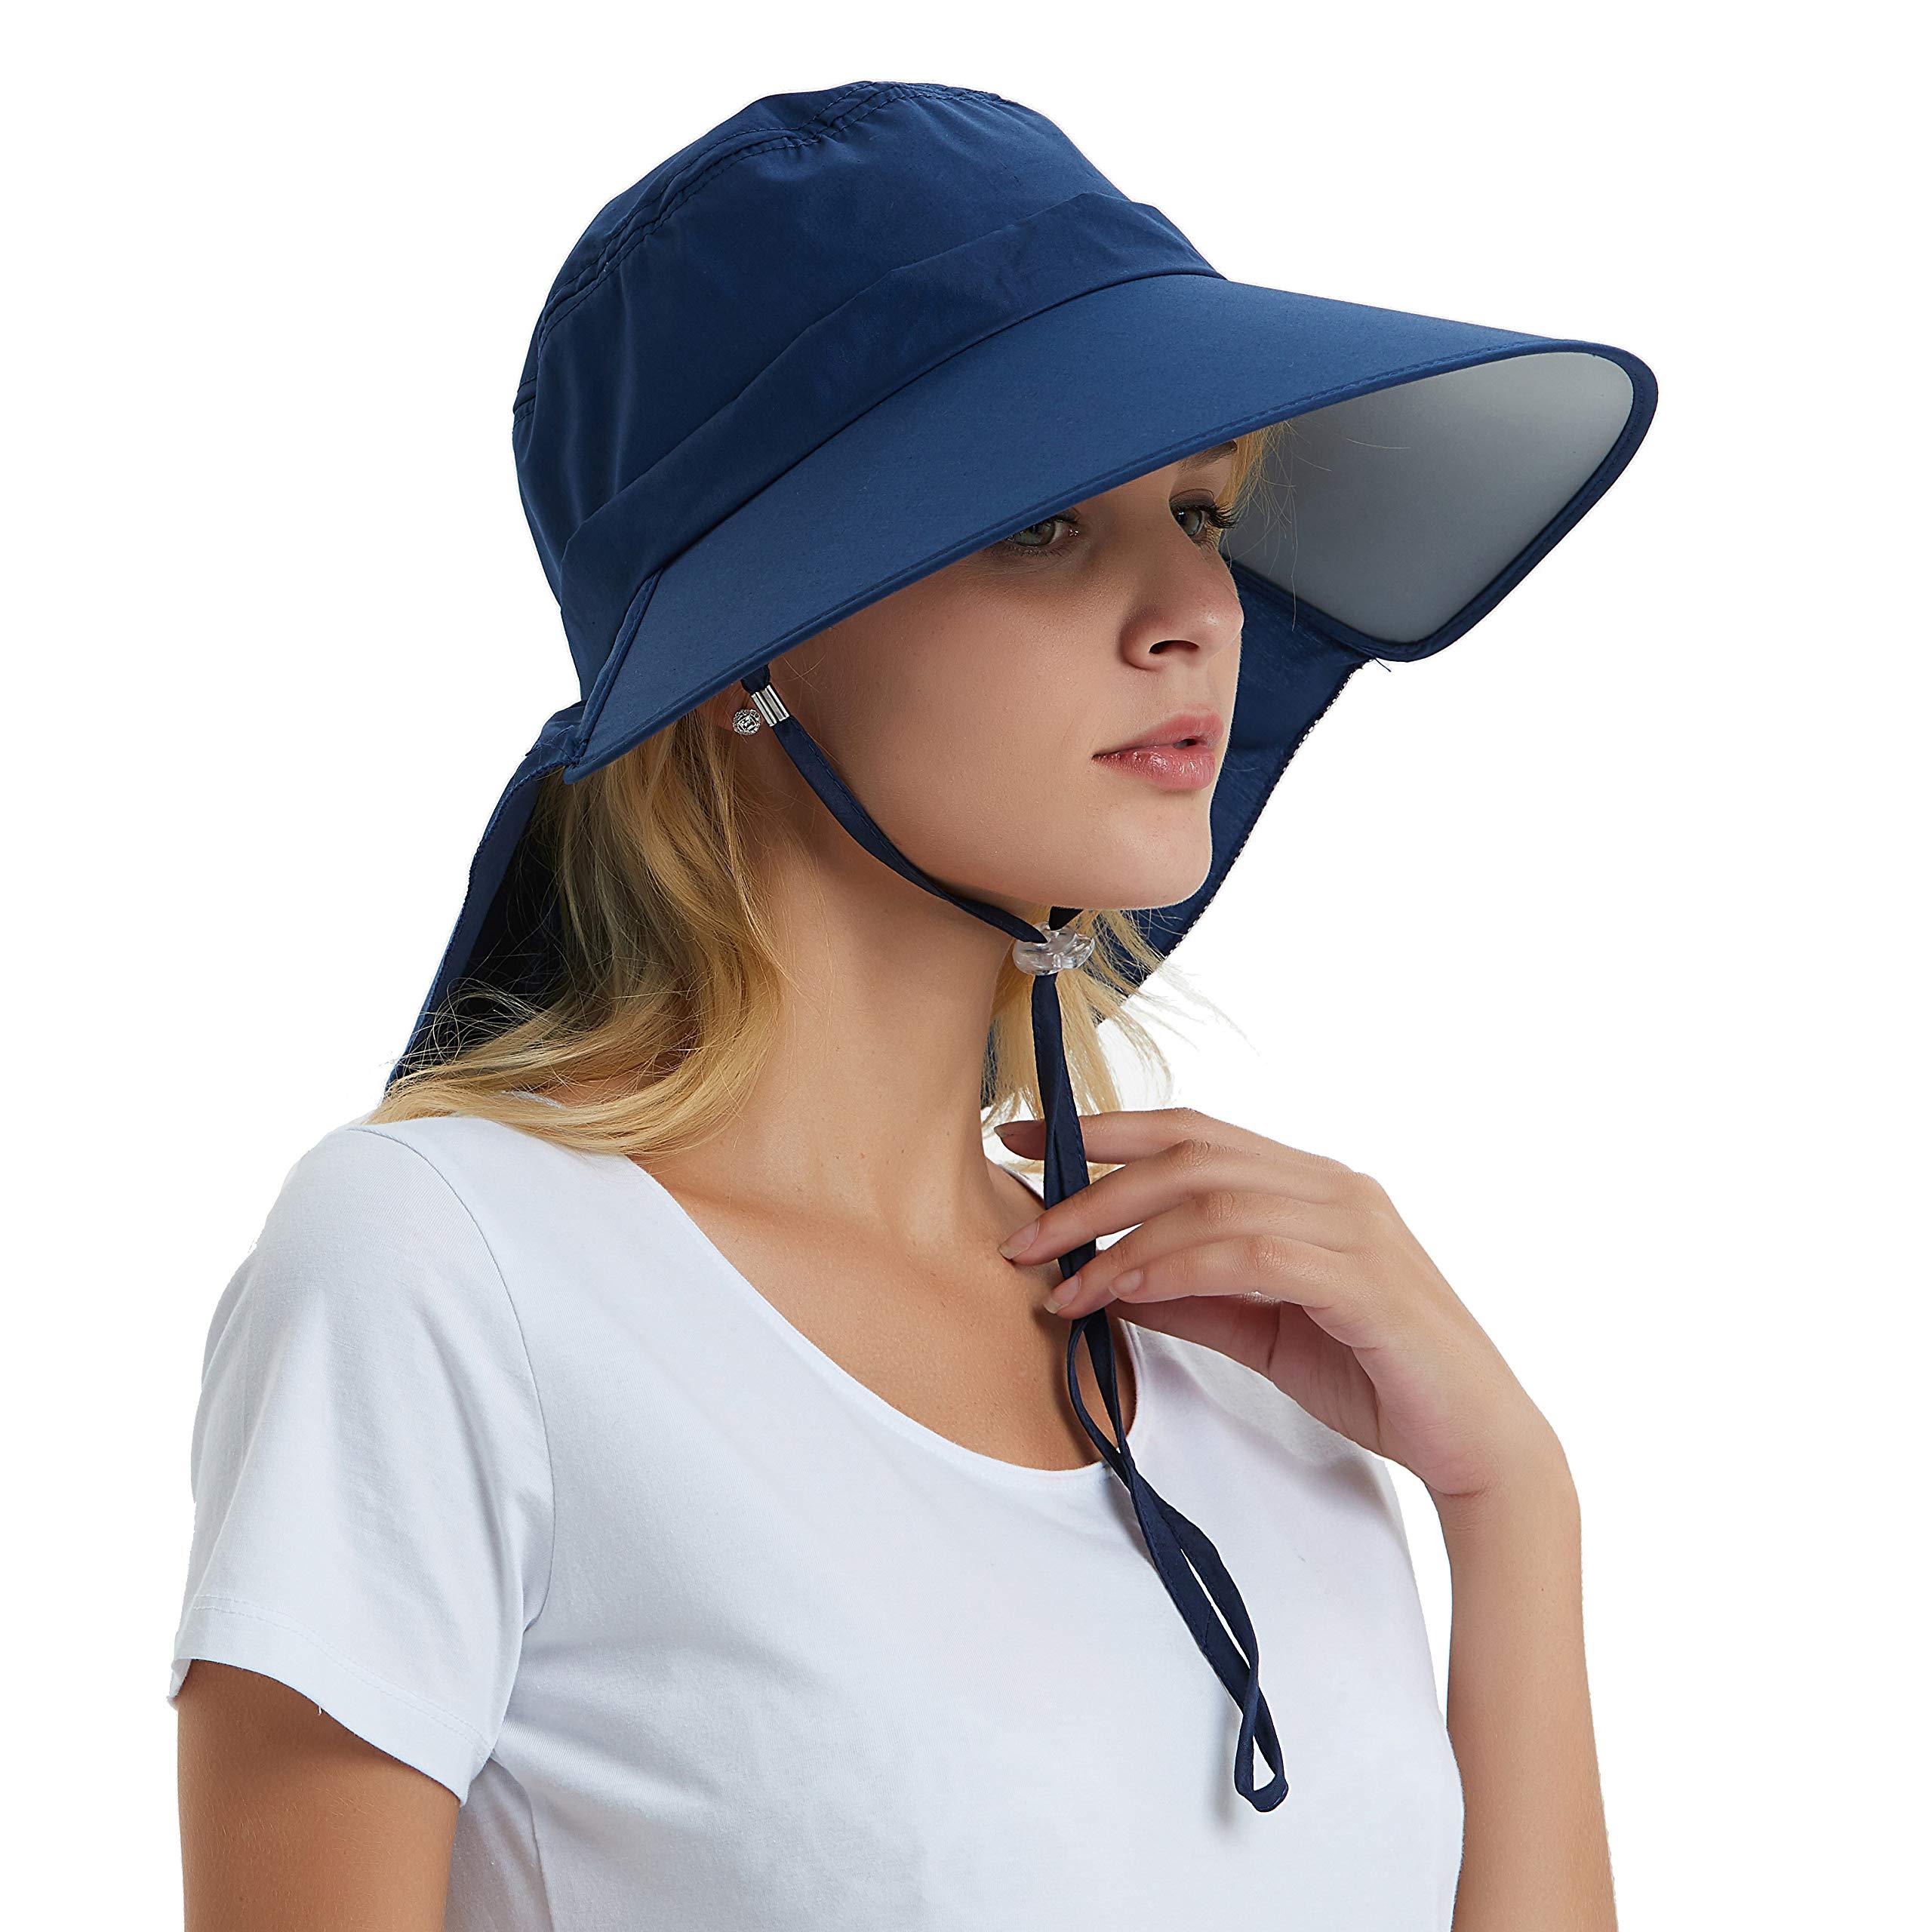 f80bc95b0c4 Best Rated in Men s Sun Hats   Helpful Customer Reviews - Amazon.com